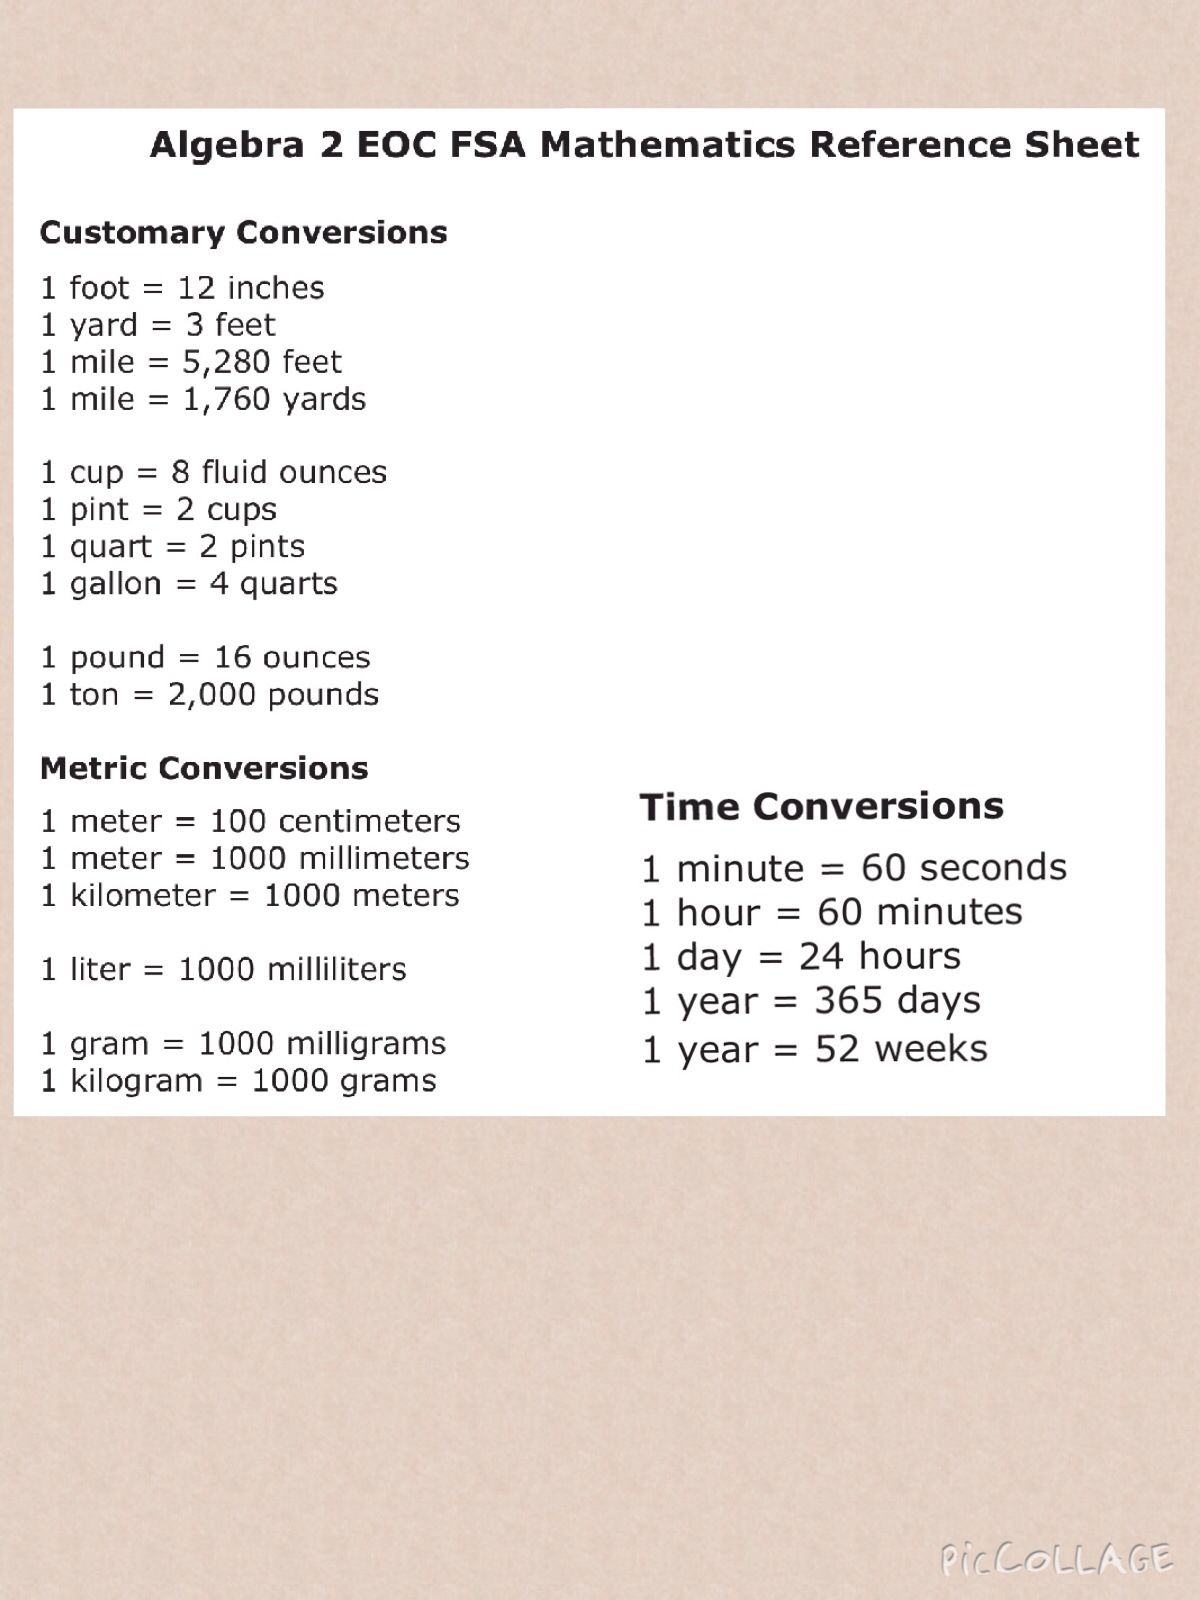 Eoc Fsa Alg2 Math Ref Sheet